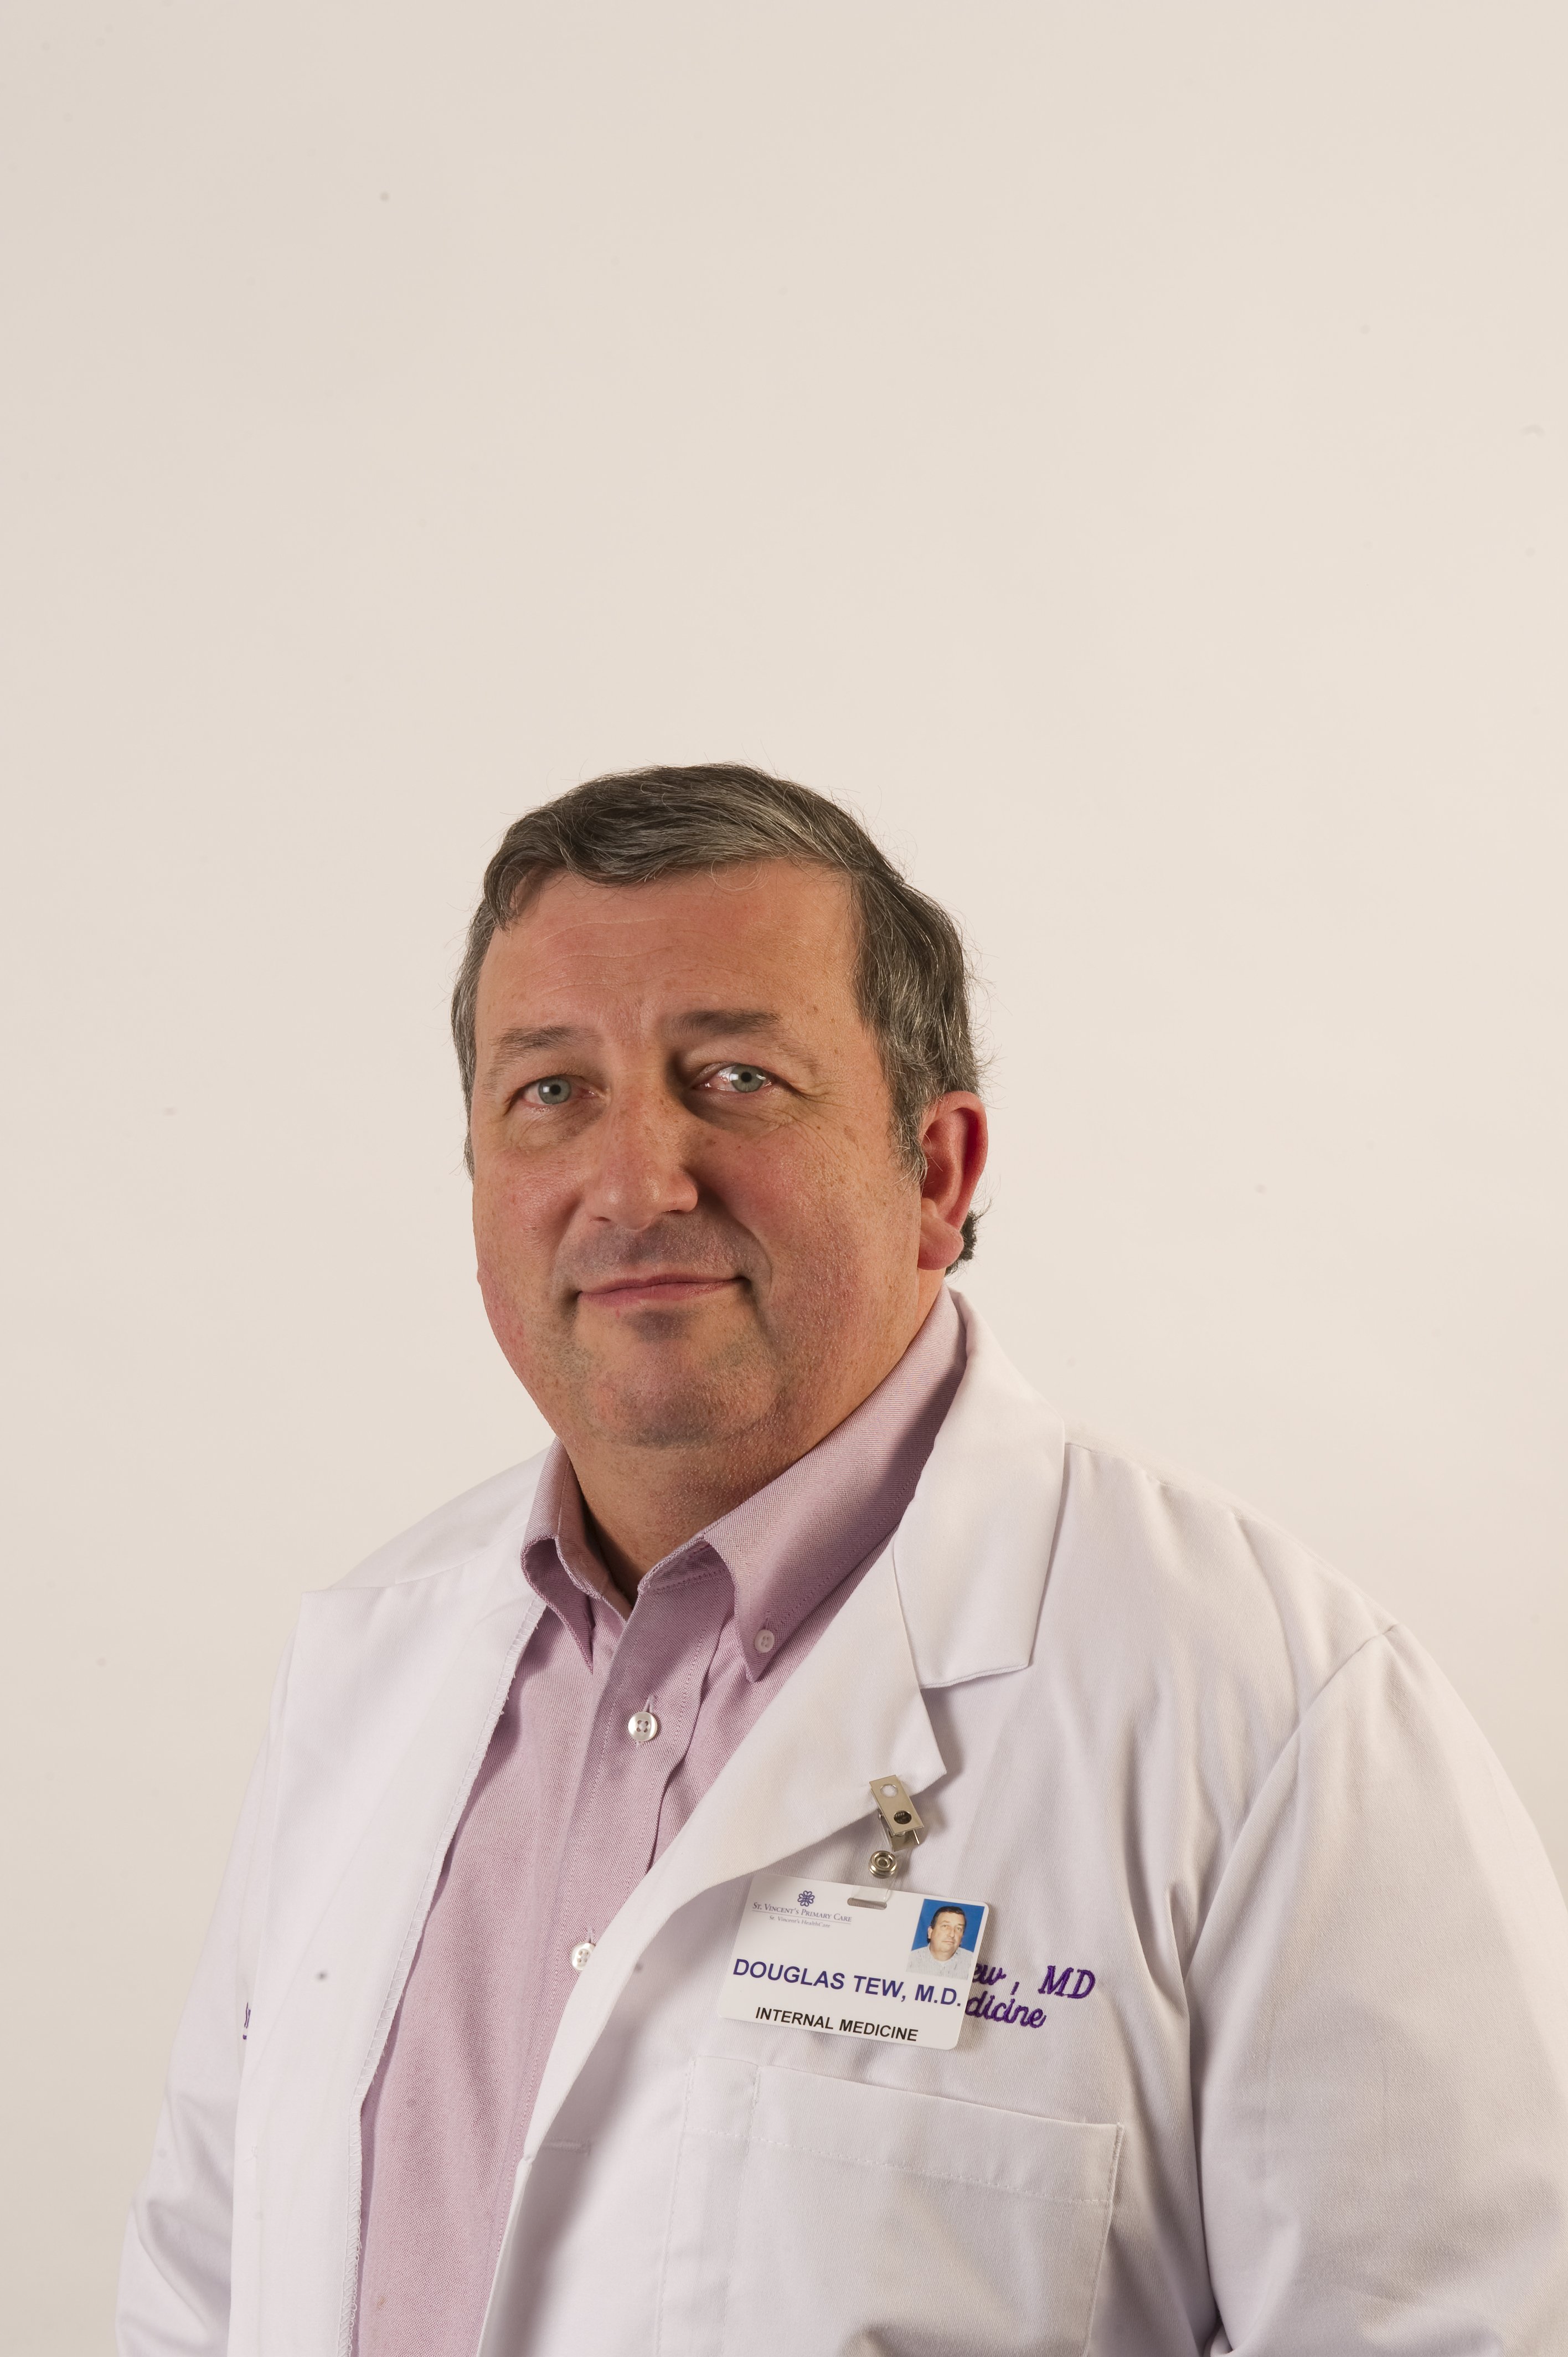 Douglas Tew, MD